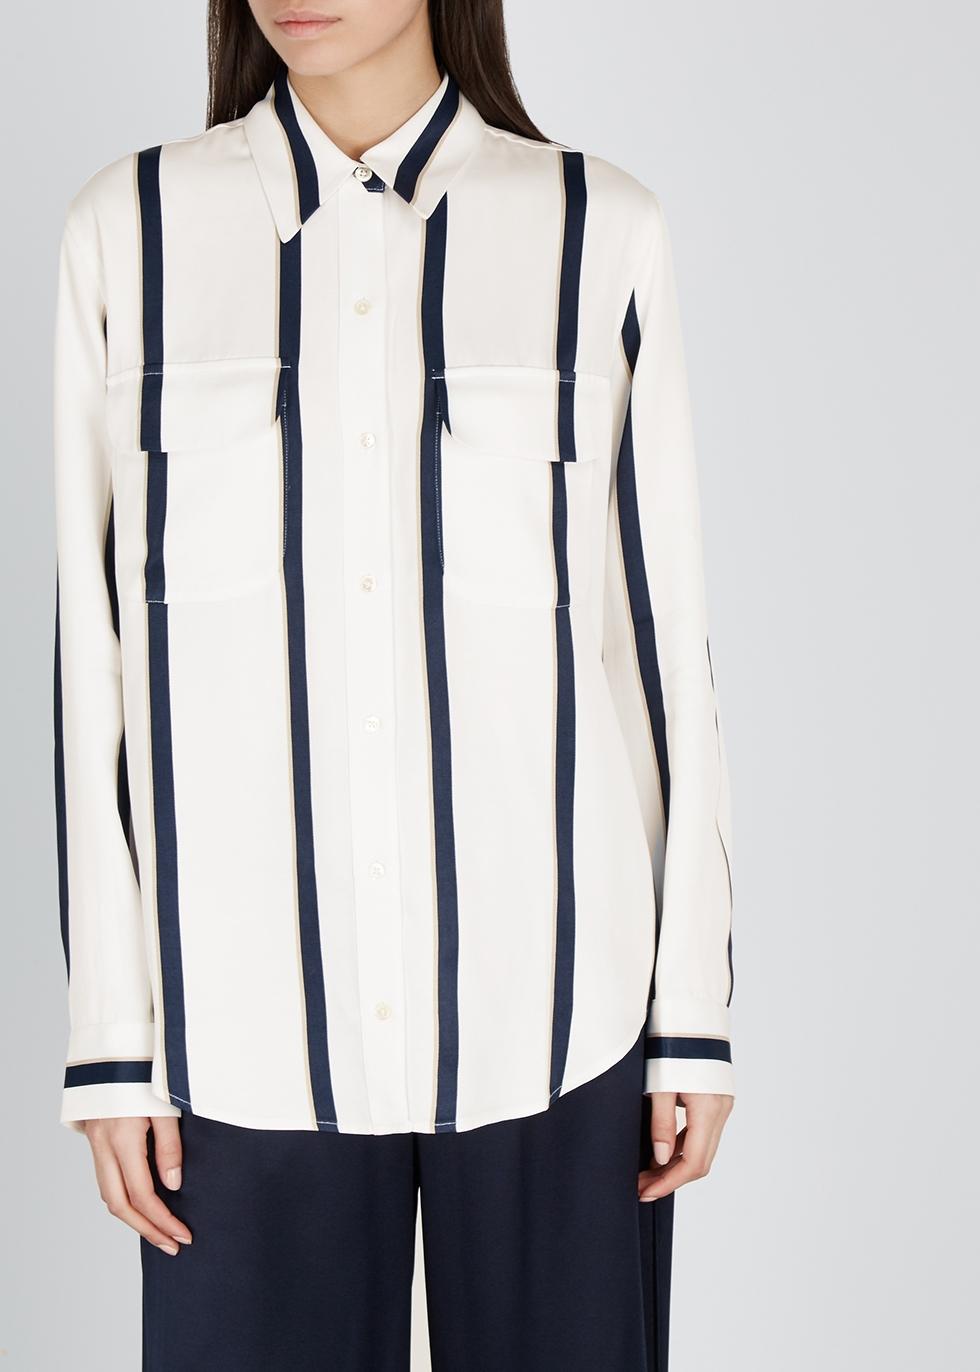 New Signature striped rayon shirt - Equipment